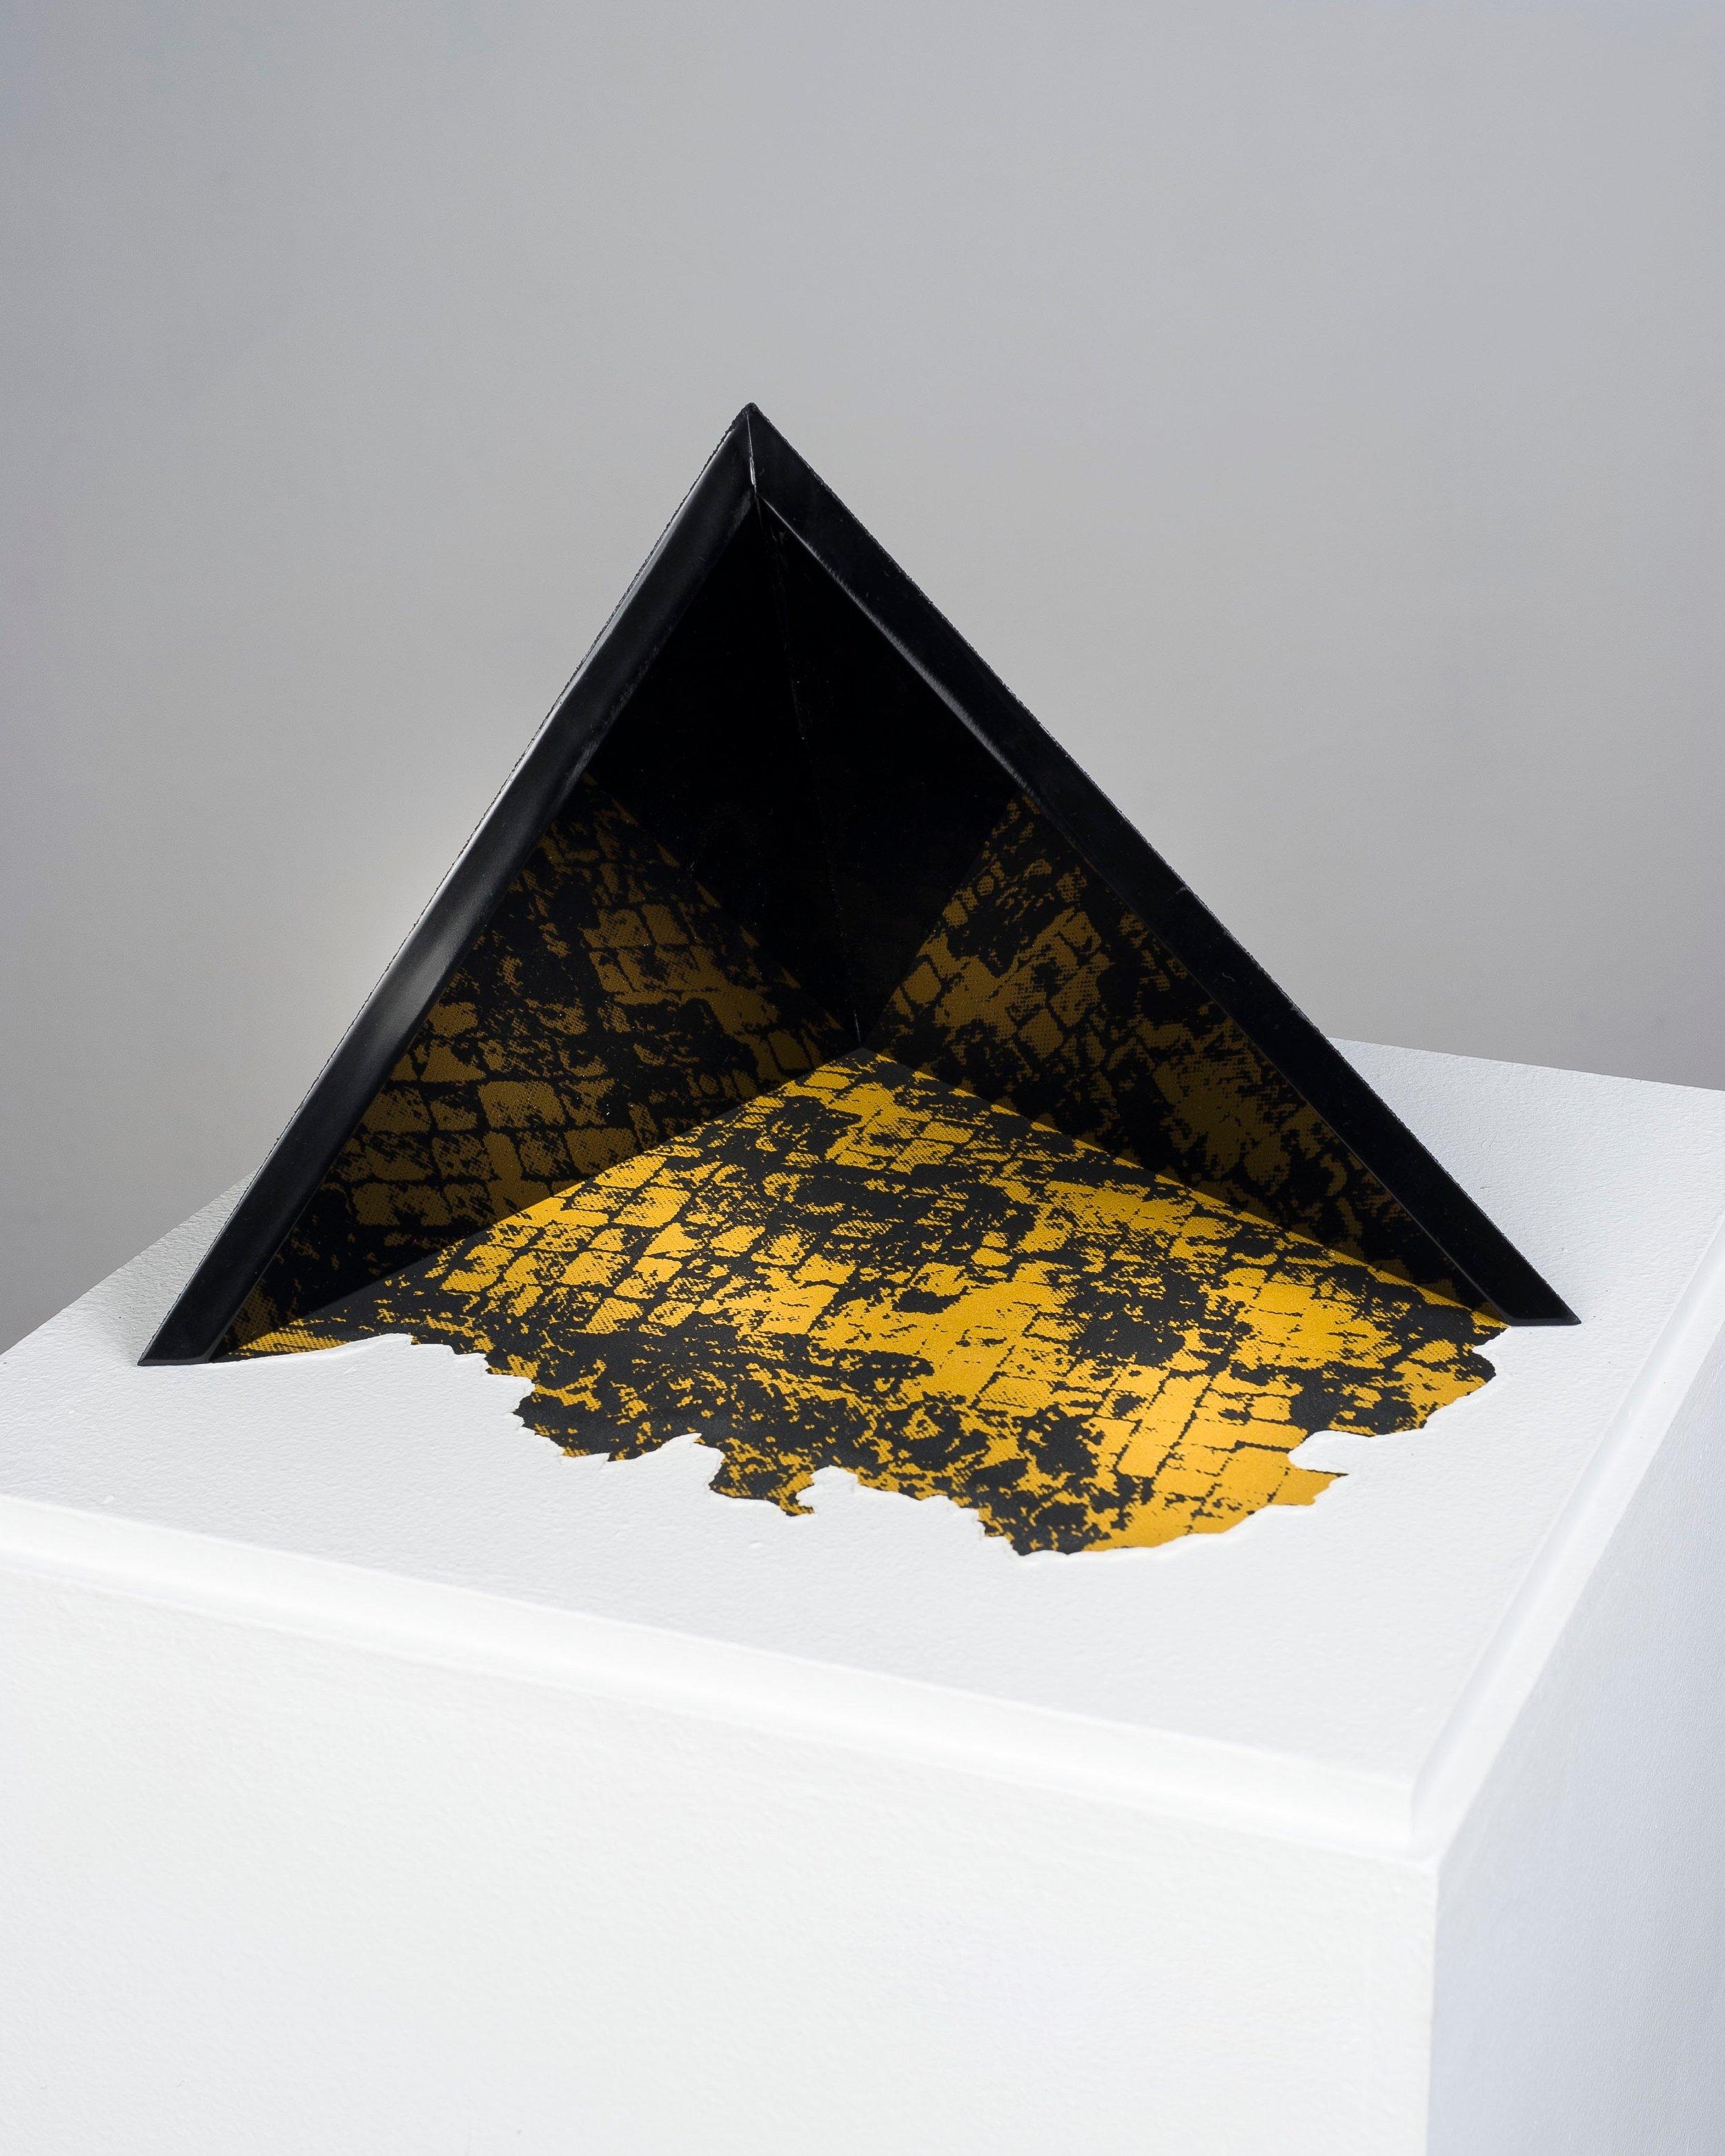 Invisible Pyramid II